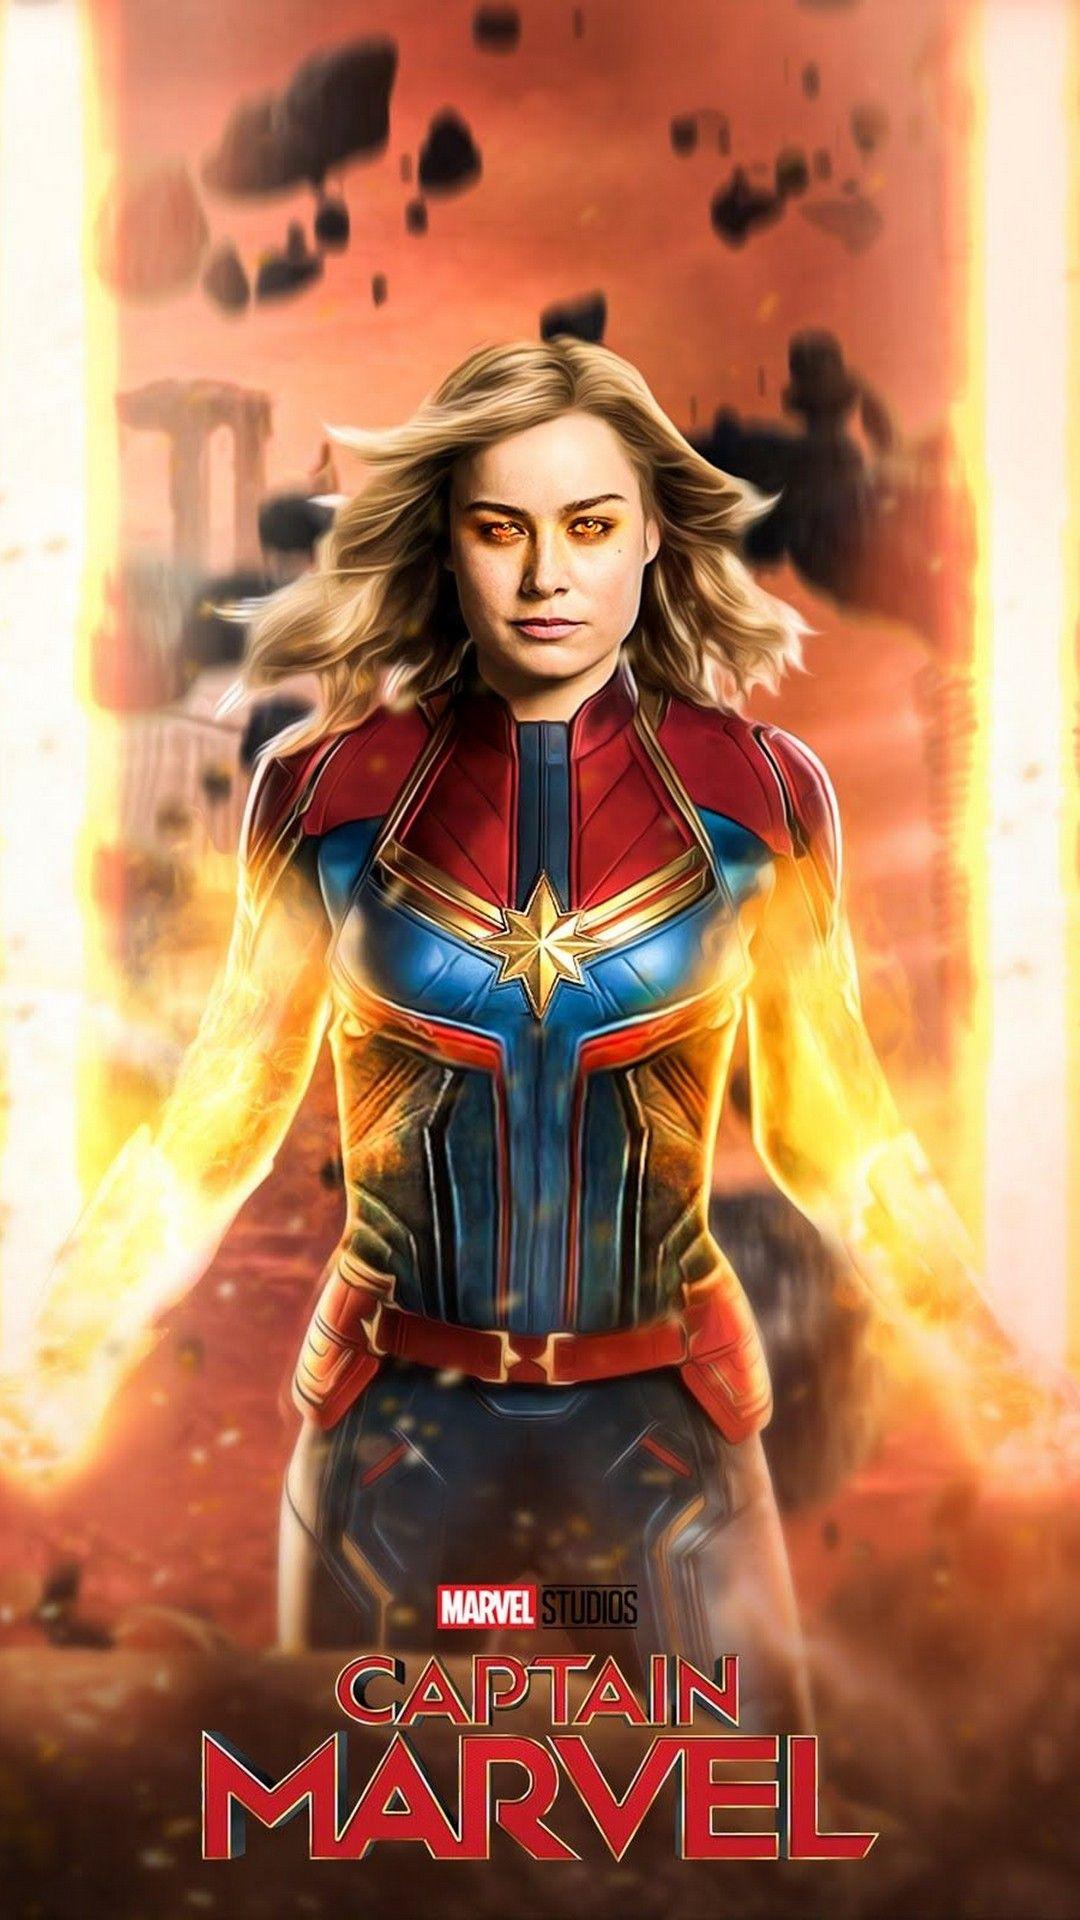 Captain Marvel 2019 Iphone 6 Wallpaper Best Movie Poster Wallpaper Hd Marvel Heroines Captain Marvel Captain Marvel Carol Danvers